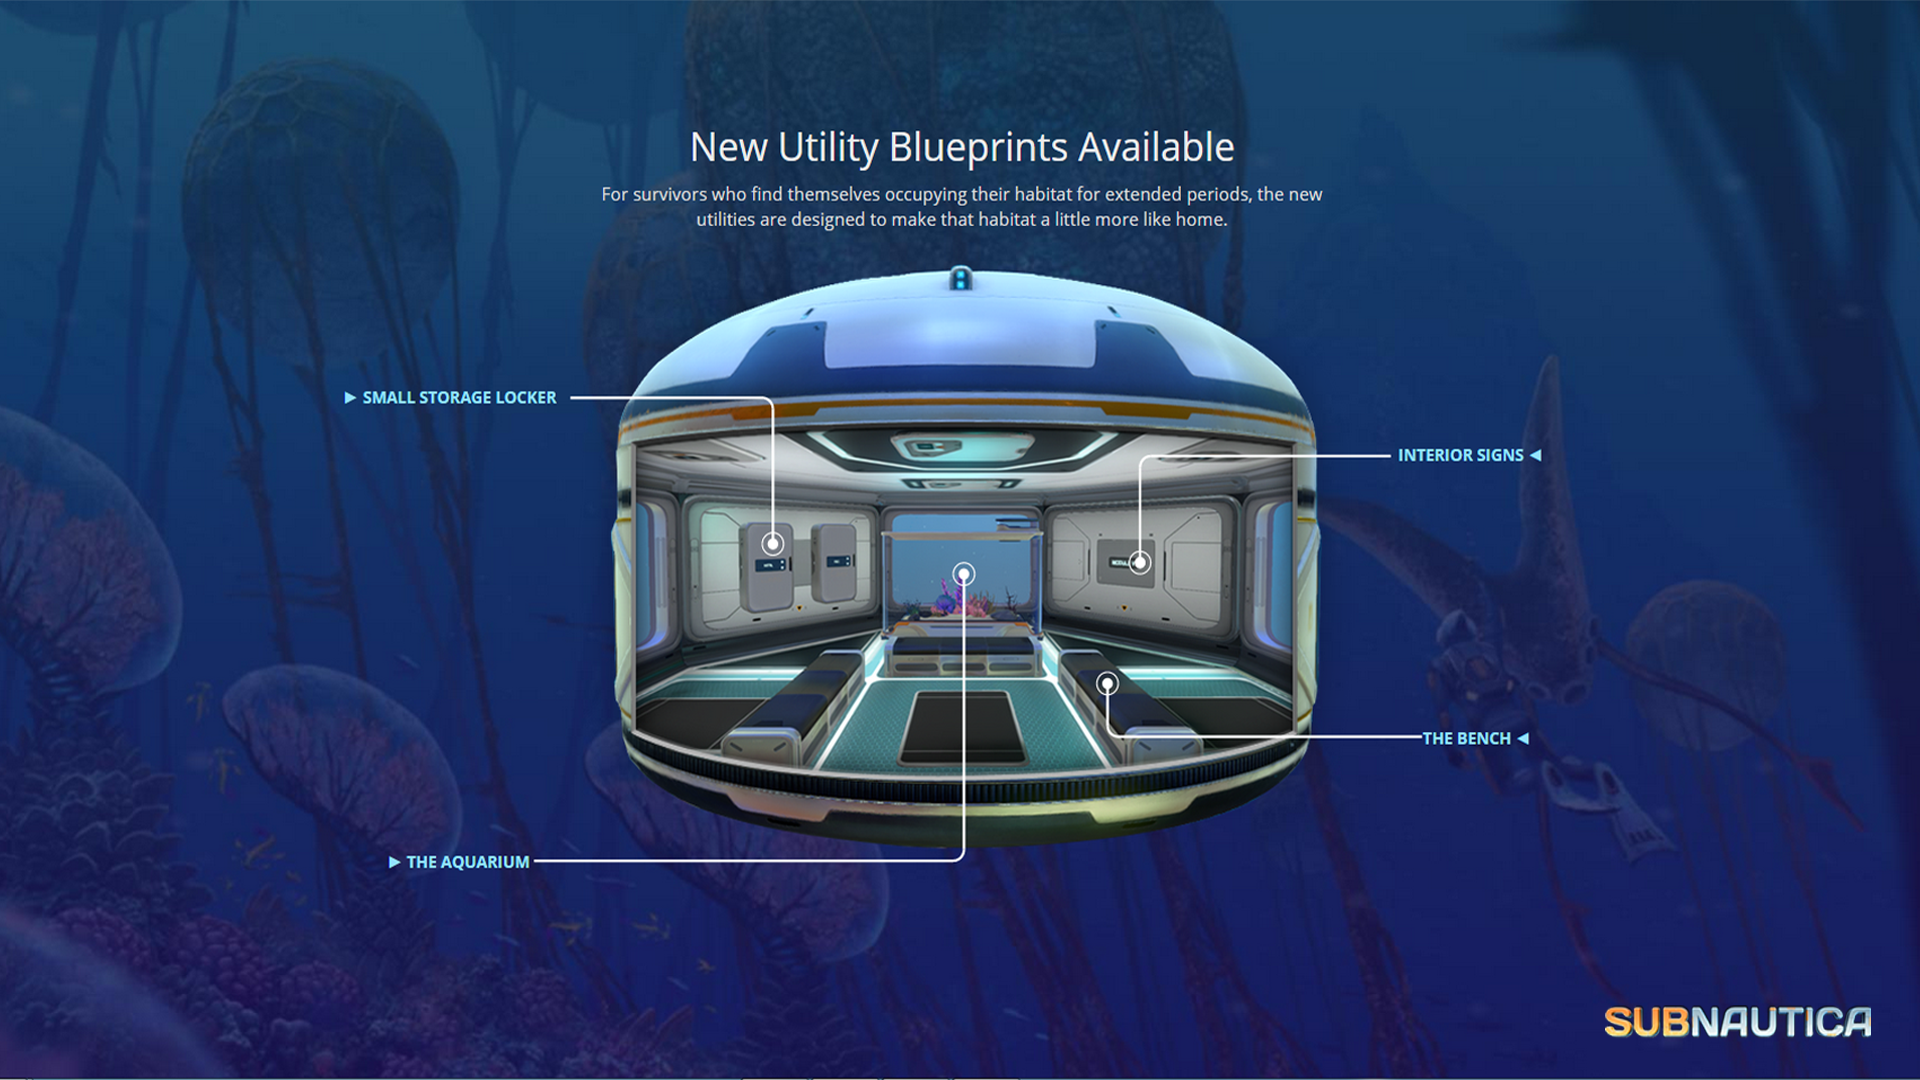 Image Room Utility Blueprints Png Subnautica Wiki